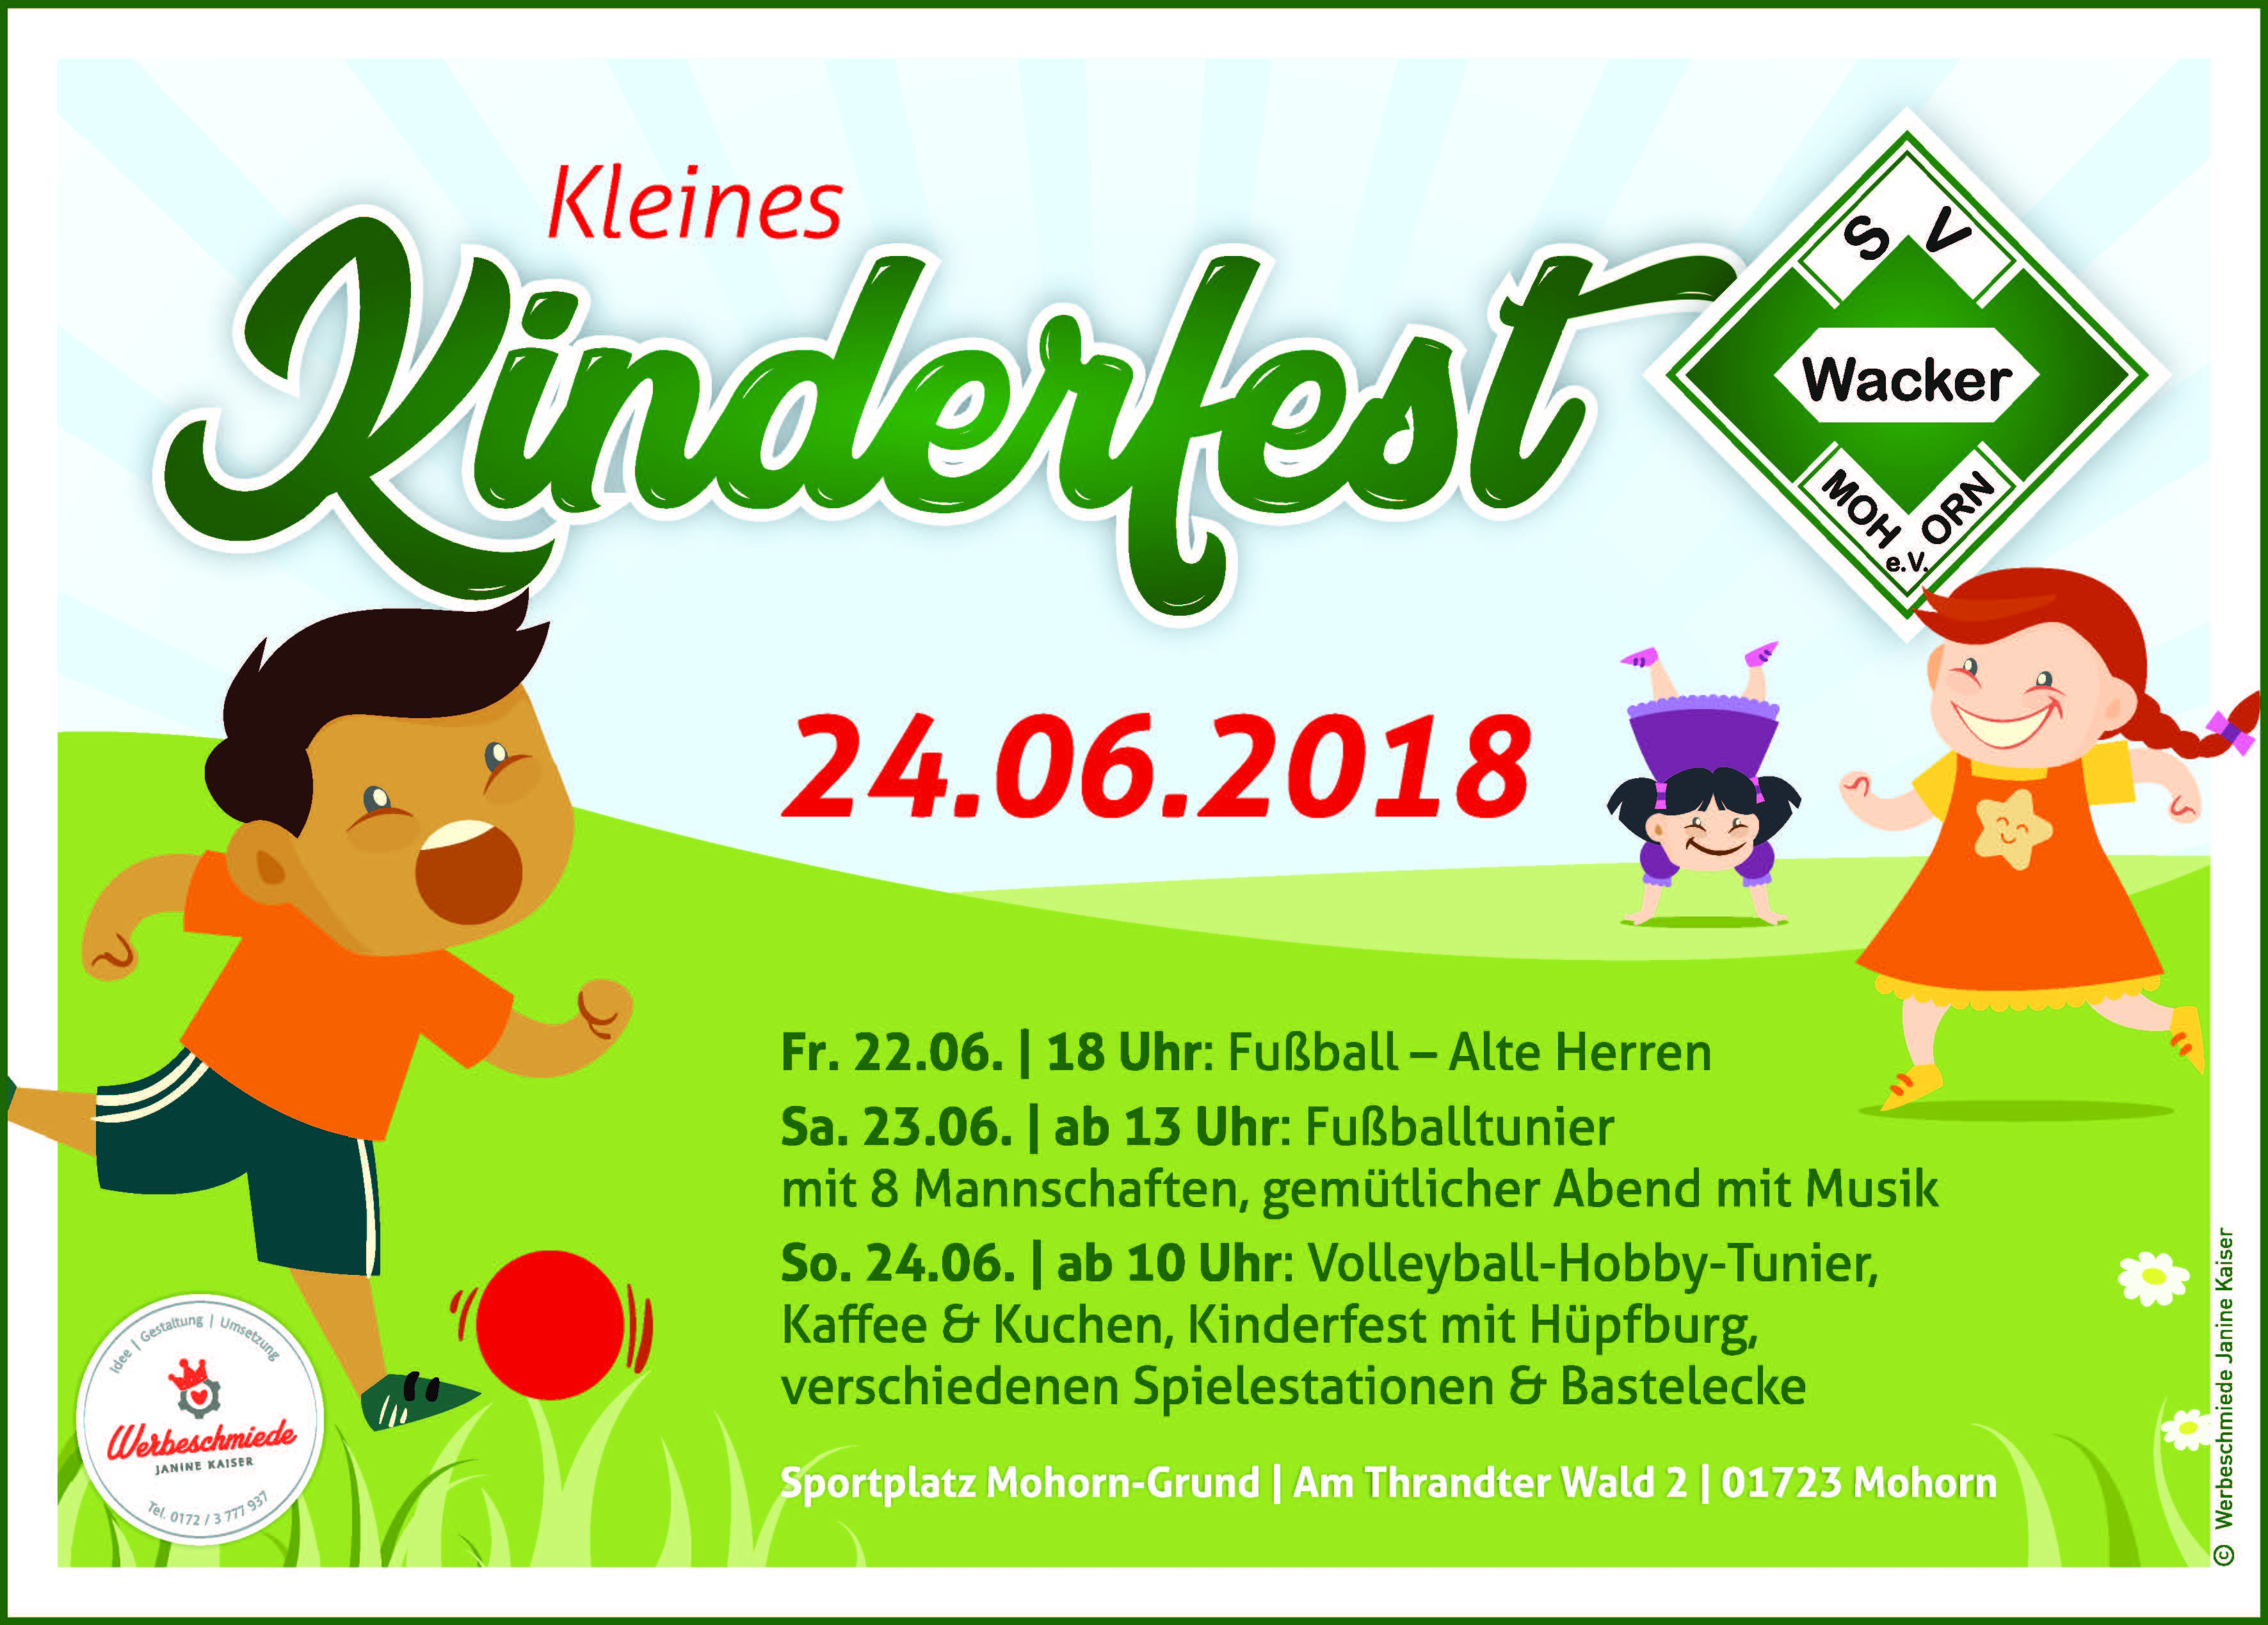 Kinderfest_SV_Wacker_24-06-2018.jpg